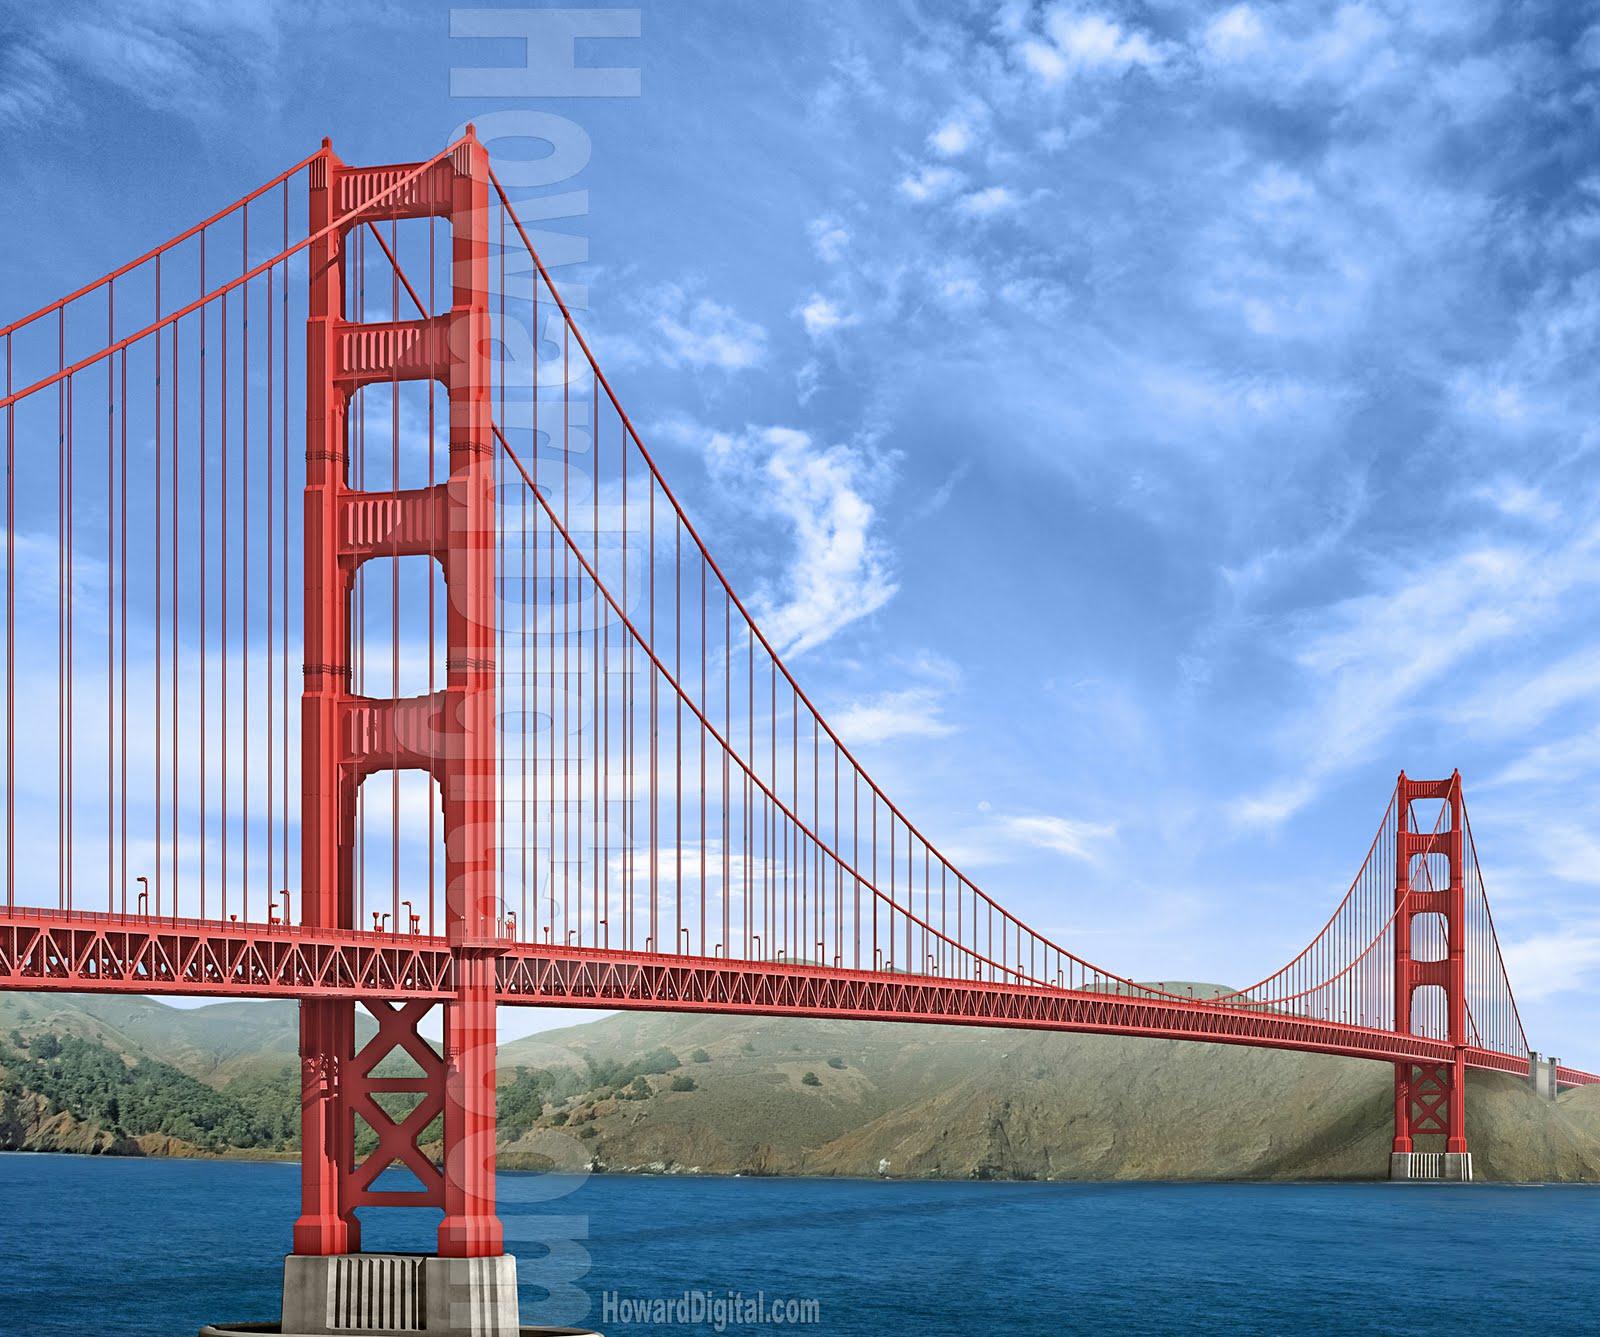 ocean 39 s cool leanring bridges. Black Bedroom Furniture Sets. Home Design Ideas